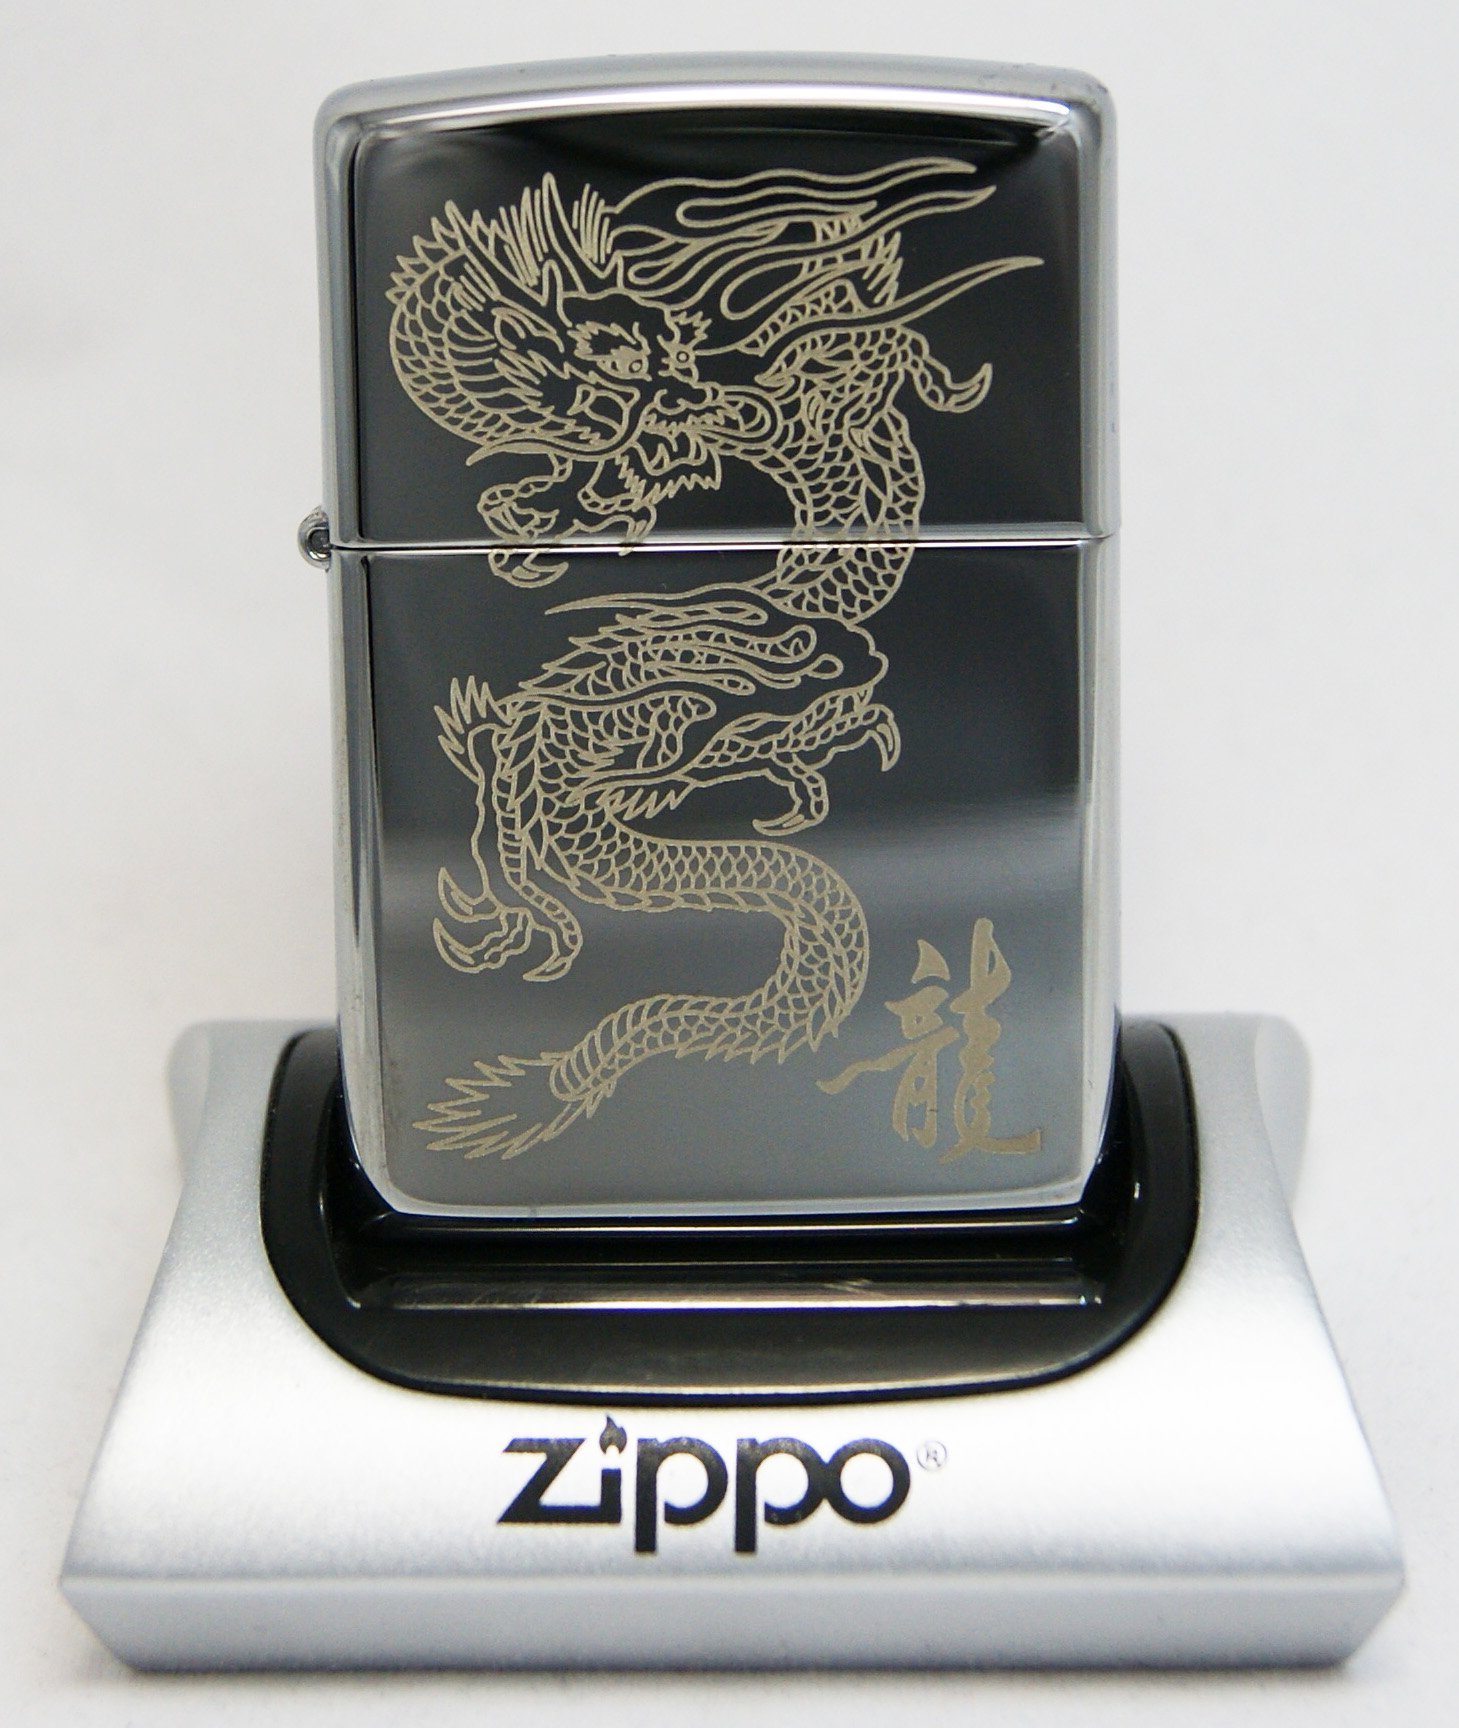 Zippo Lighter 250 Dragon (No Color)